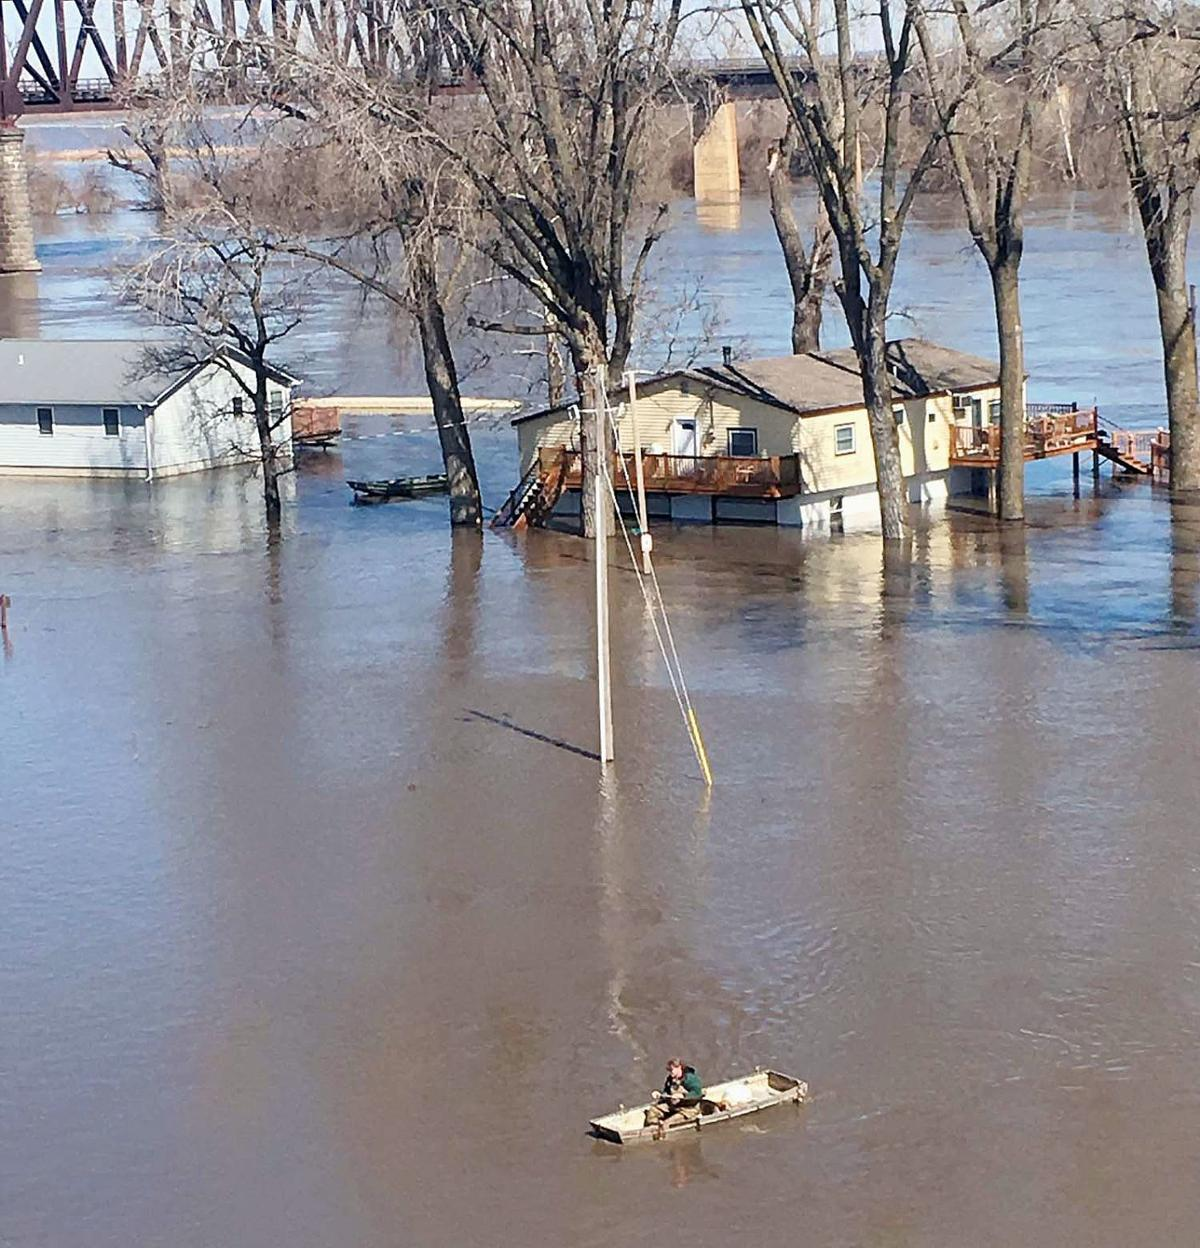 Missouri River flooding leaves behind devastation | Hiawatha World